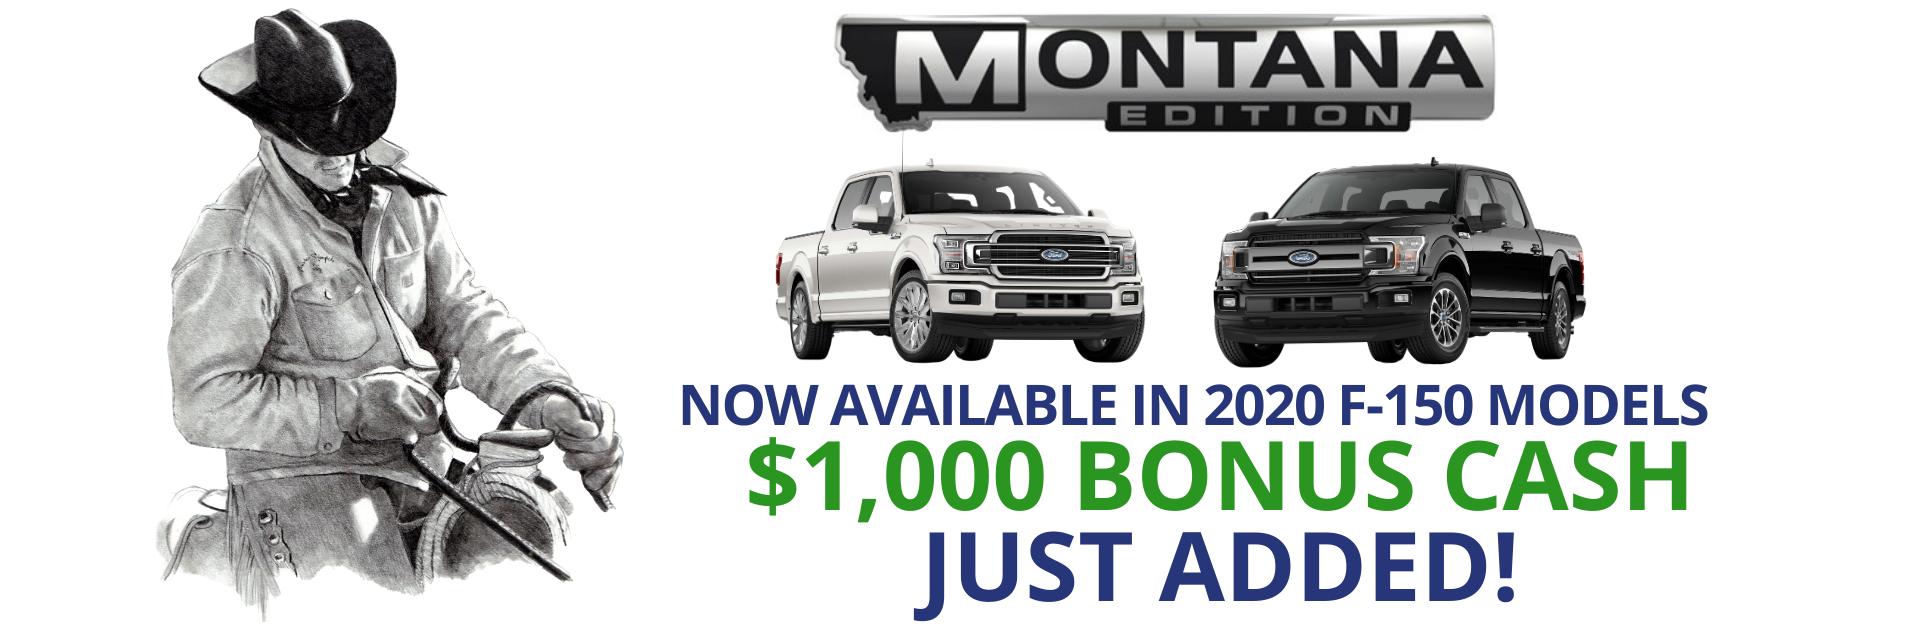 Montana Edition Landing Page3